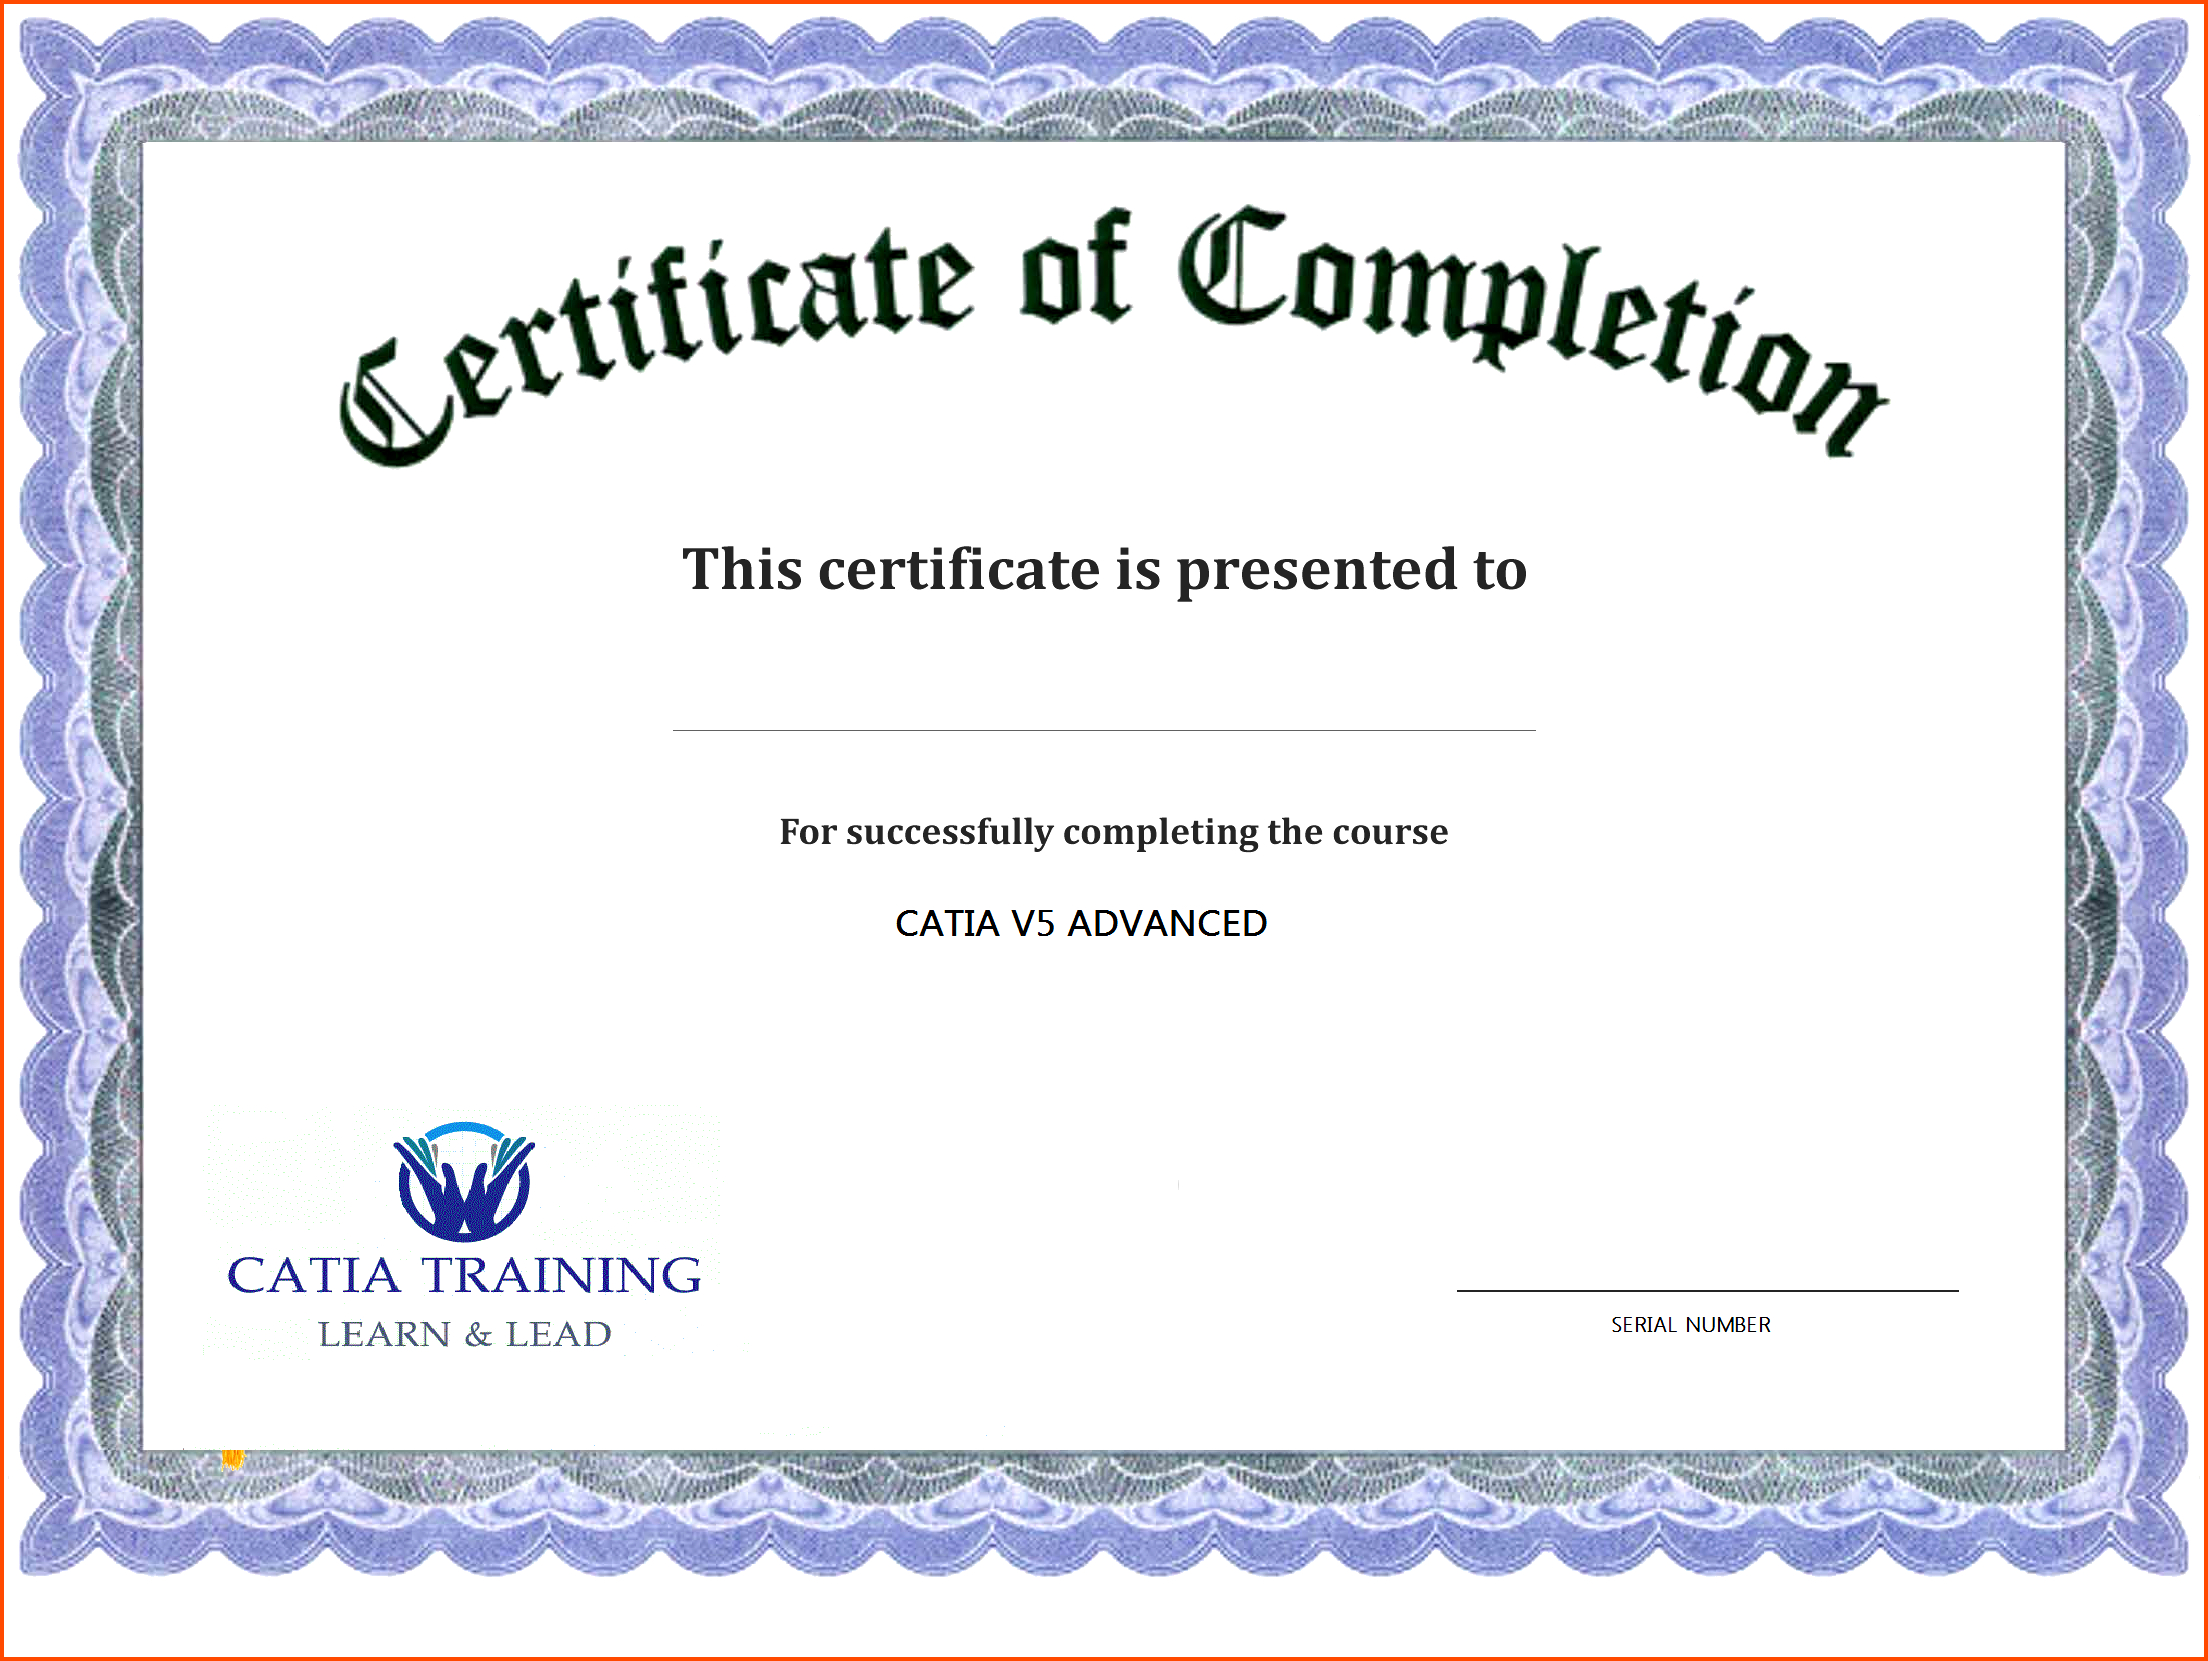 Free Printable Editable Certificates Birthday Celebration Brochure - Free Customizable Printable Certificates Of Achievement